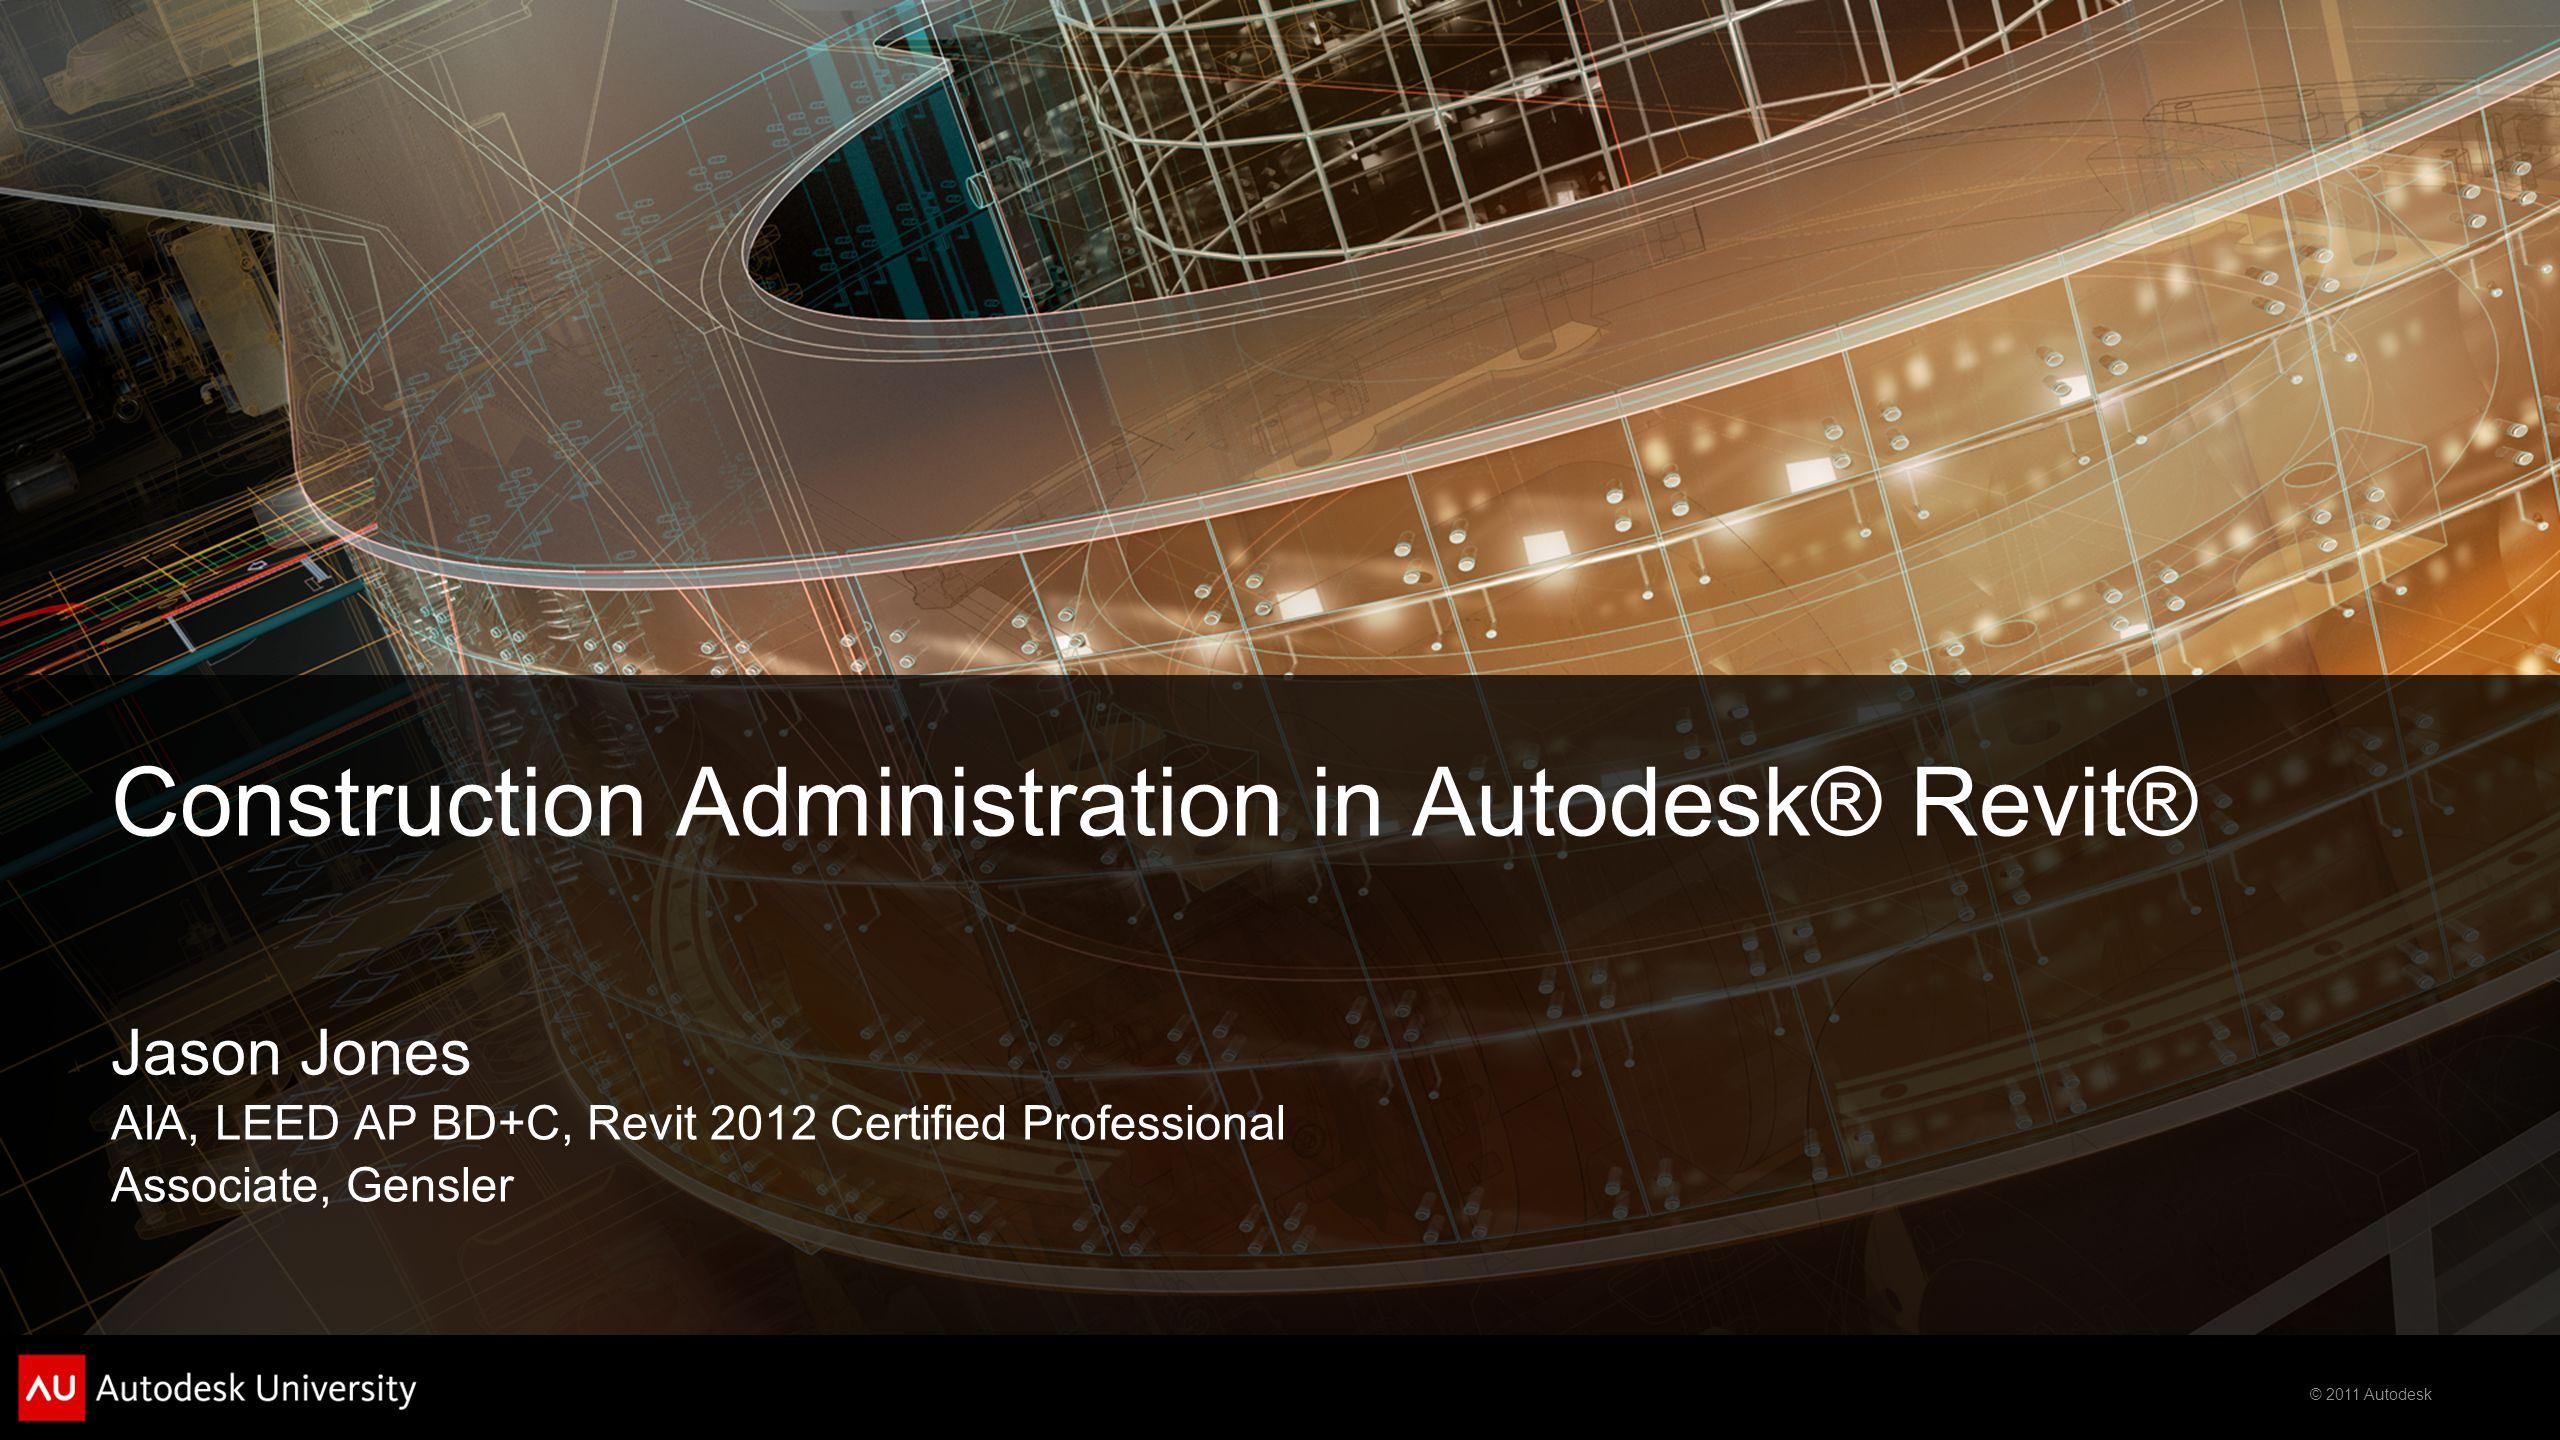 © 2011 Autodesk Construction Administration in Autodesk® Revit® Jason Jones AIA, LEED AP BD+C, Revit 2012 Certified Professional Associate, Gensler